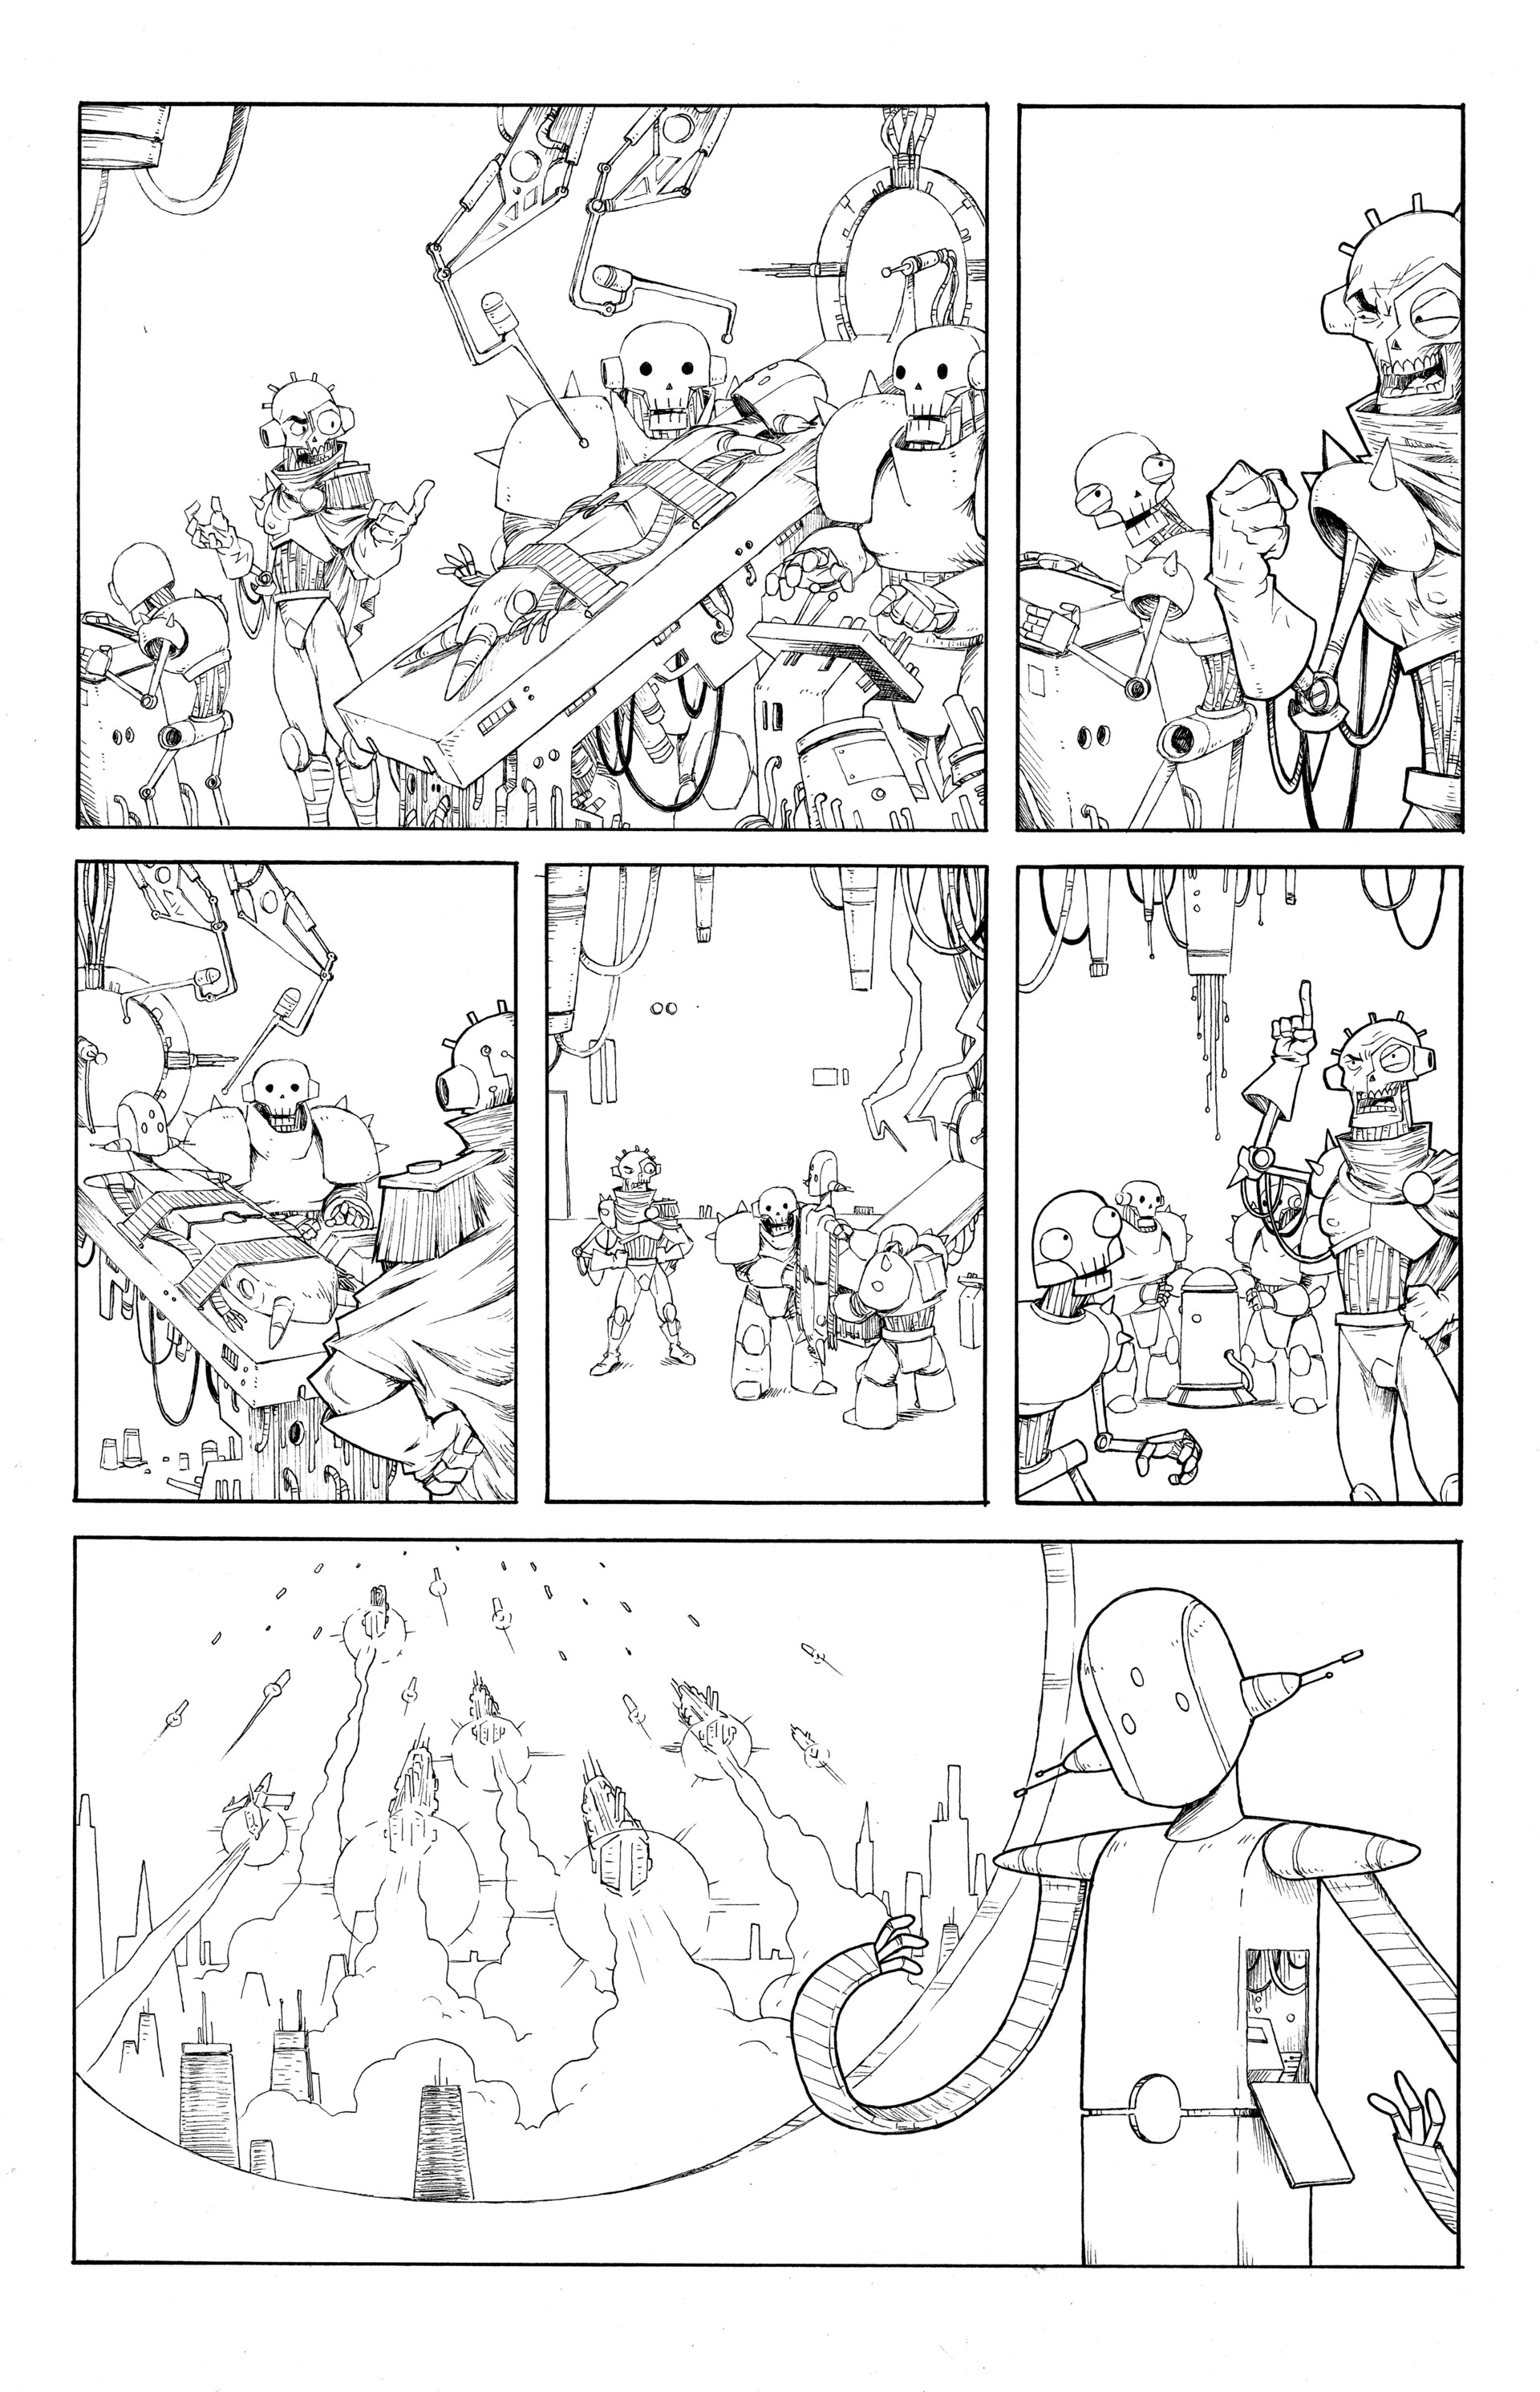 Max haig pg4 ink